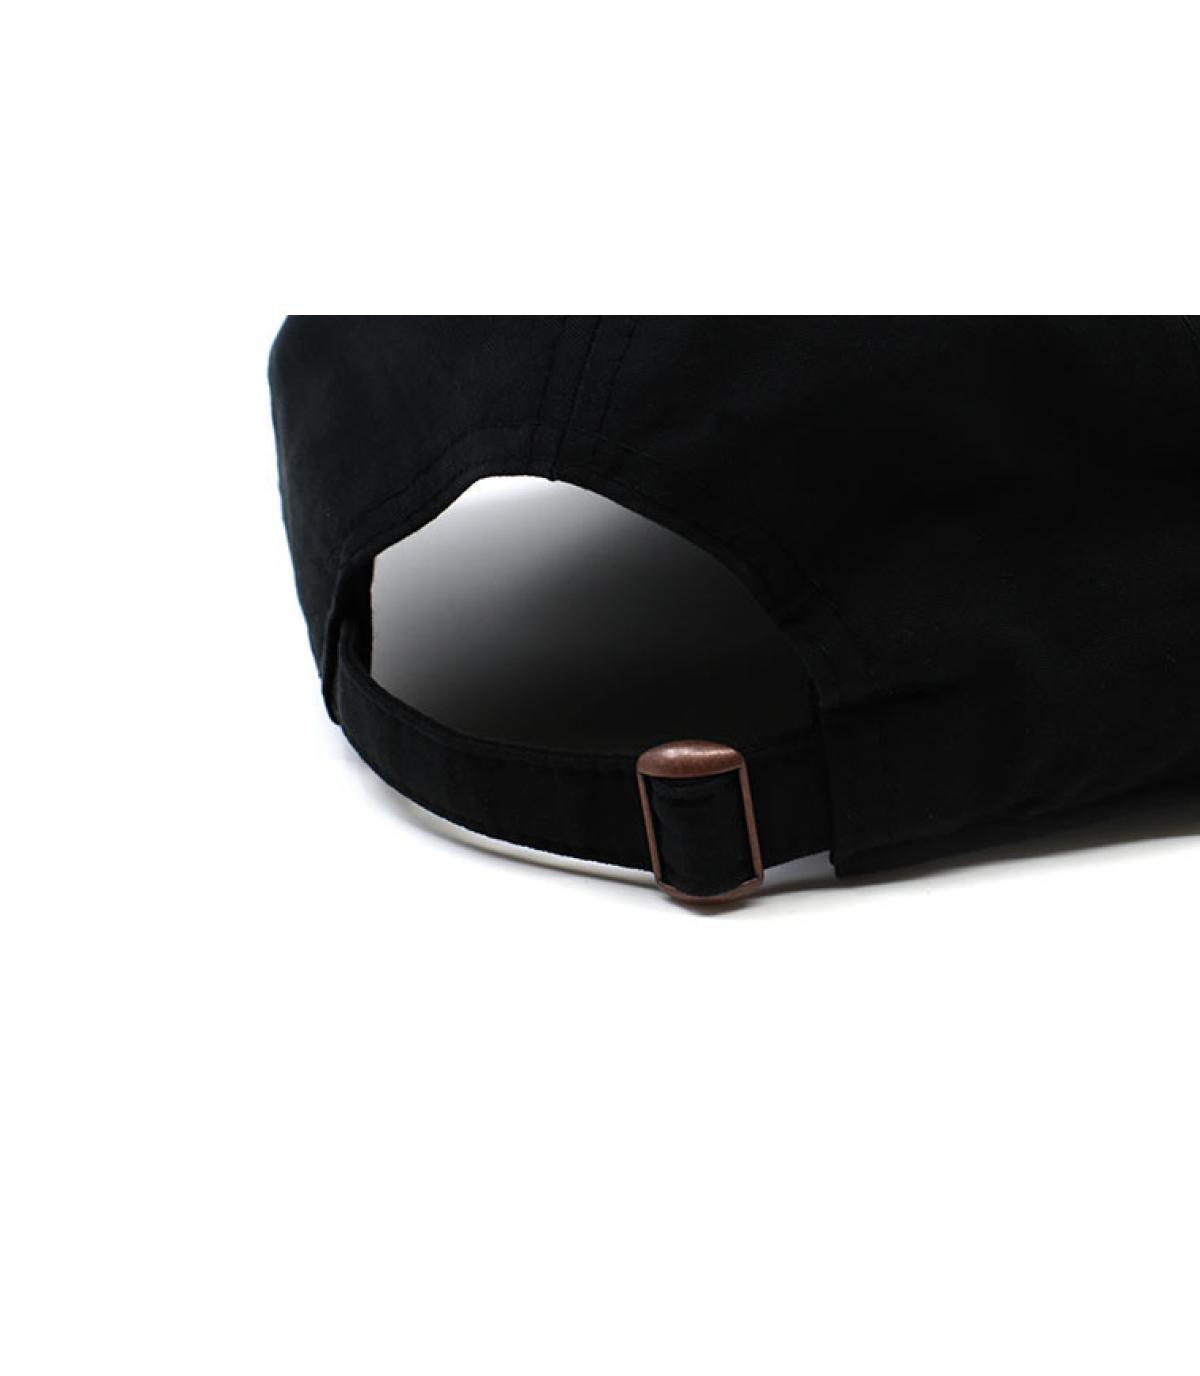 Details Light Wight Nylon Packable 9Twenty NY black - afbeeling 5